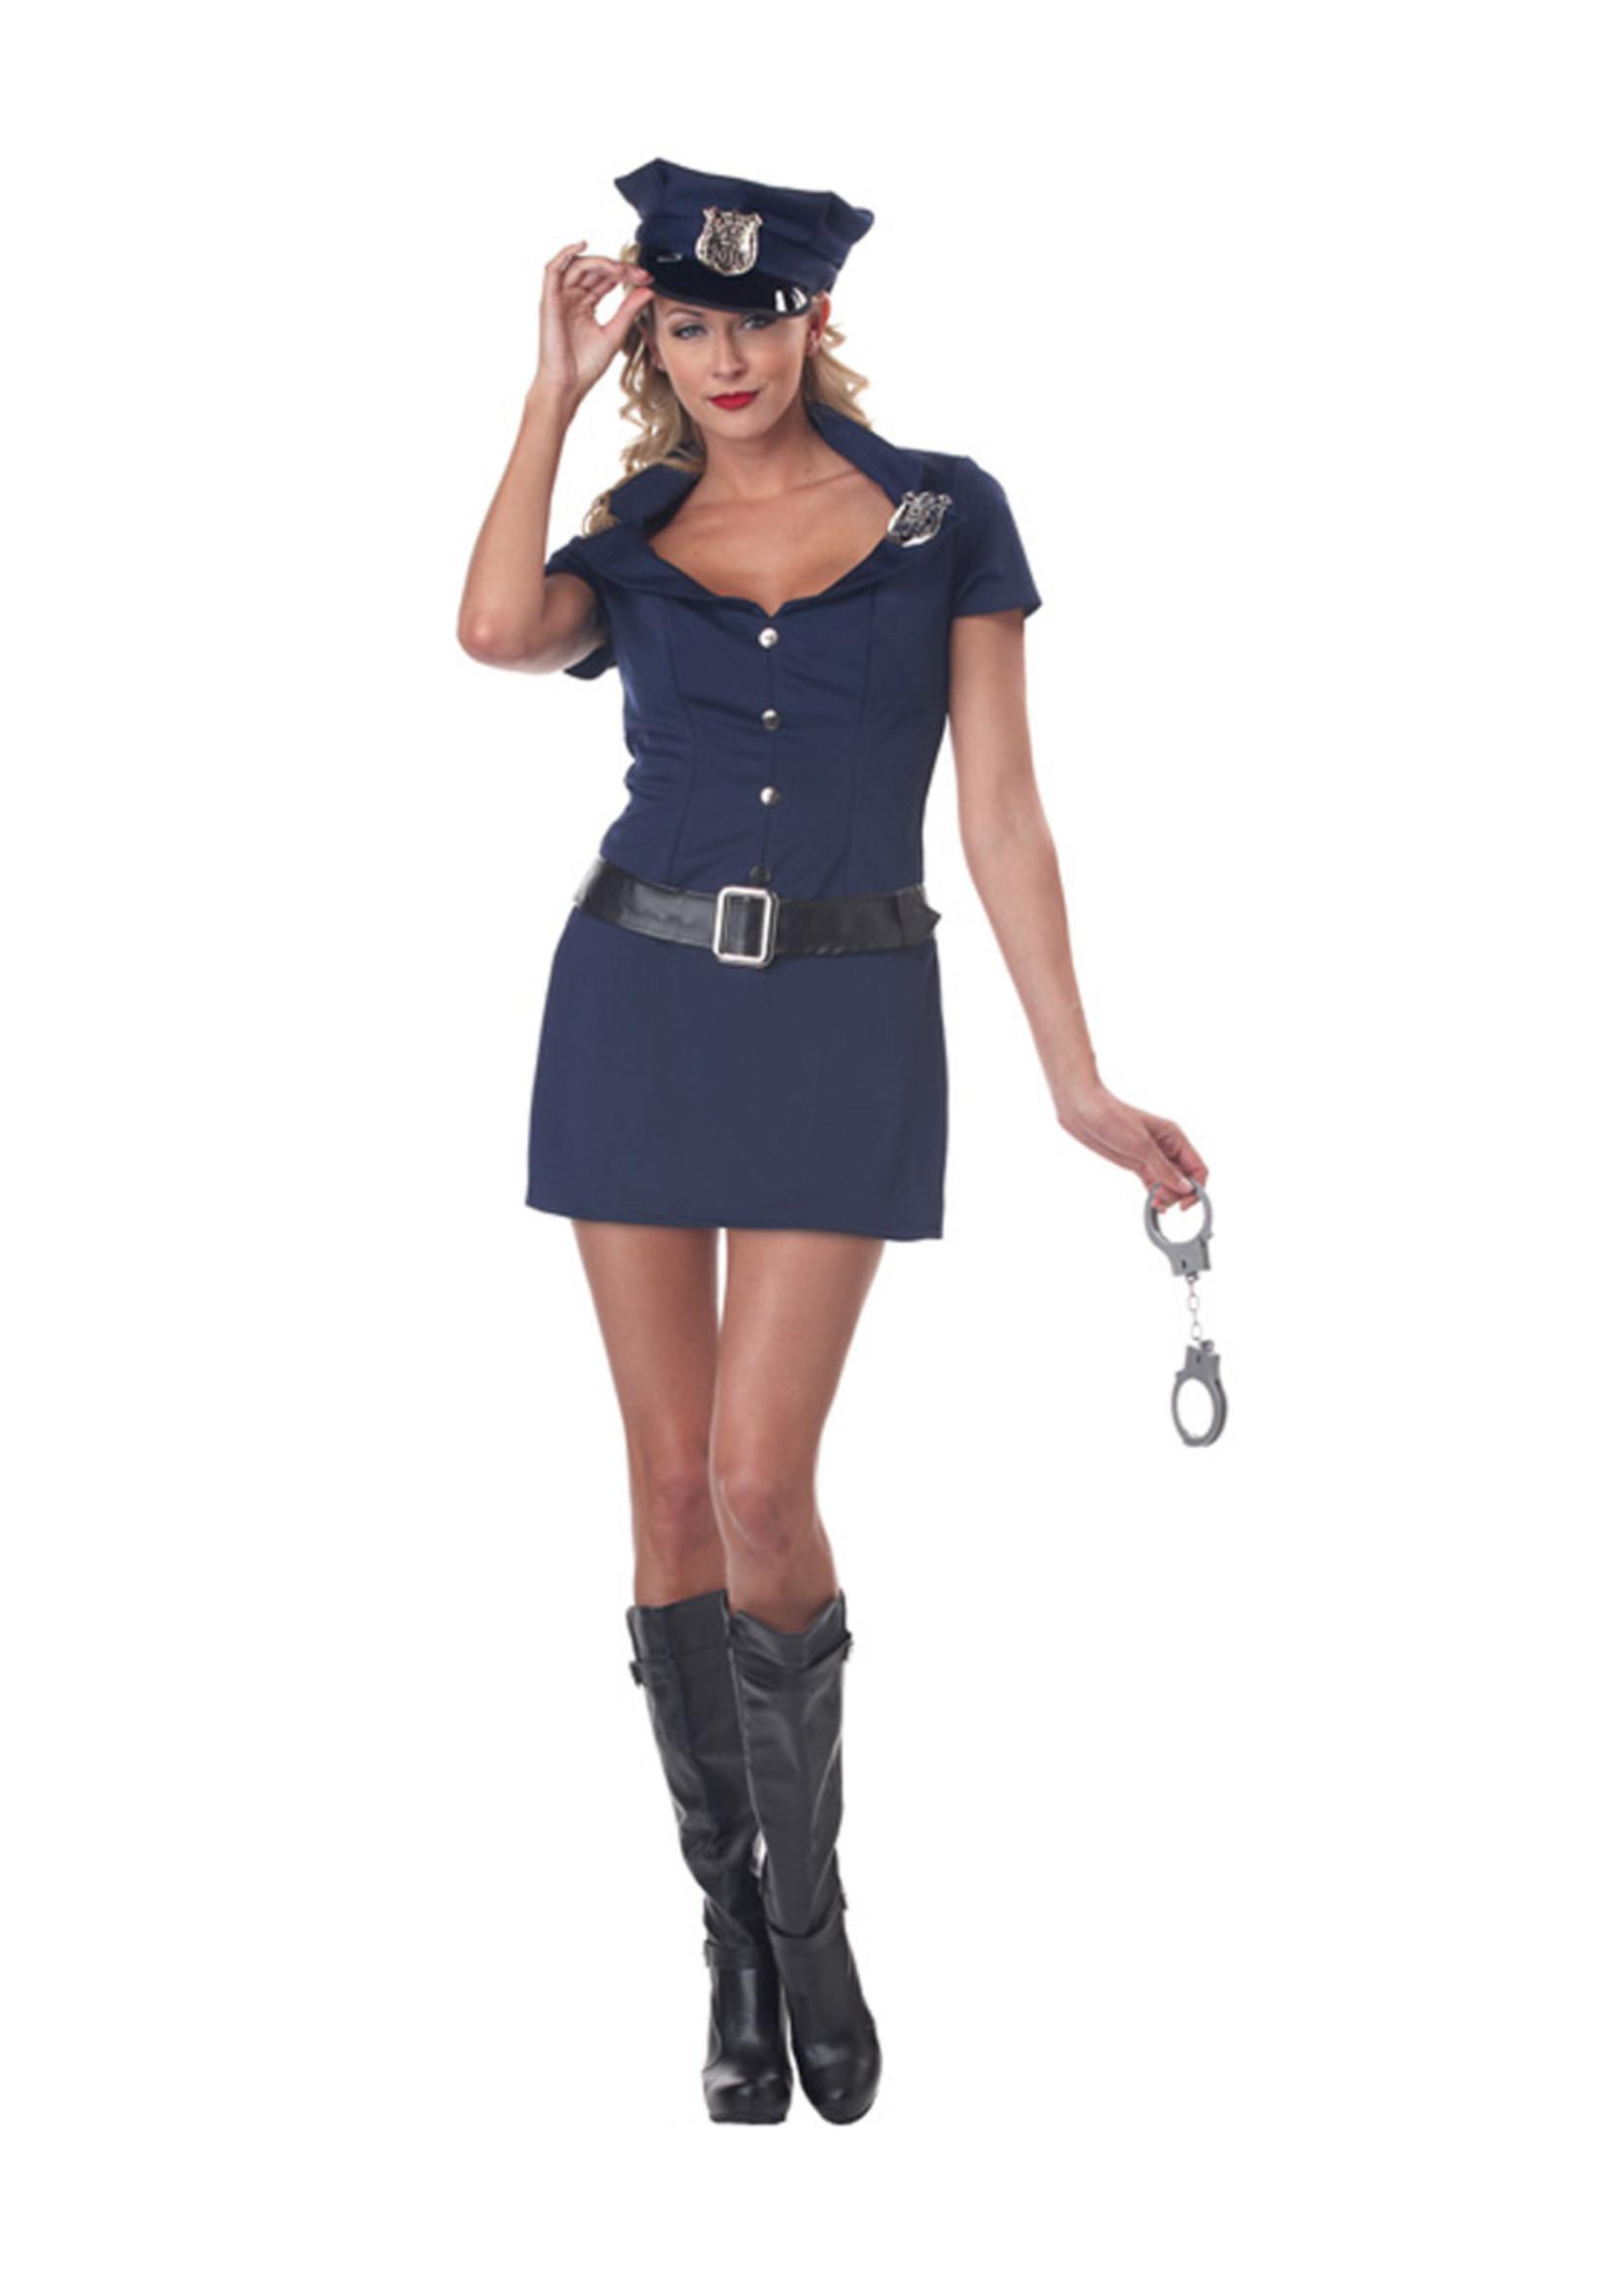 Police Woman Costume - Women's